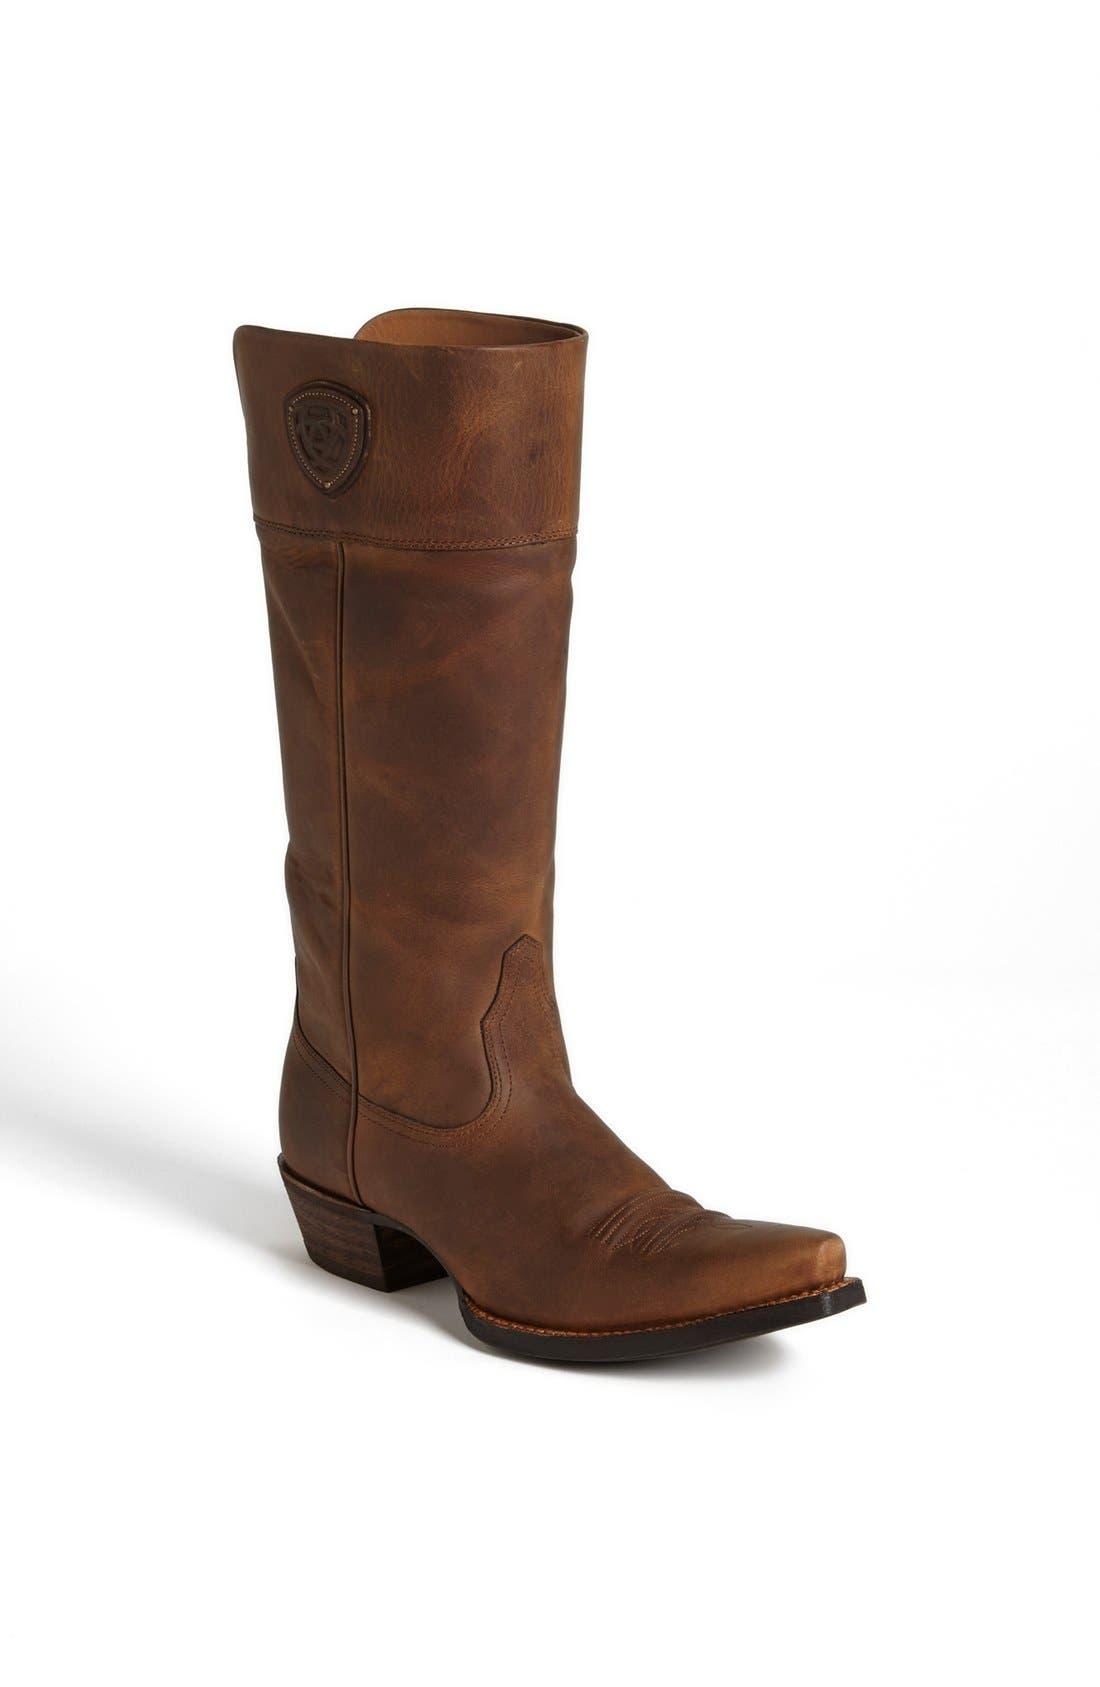 Main Image - Ariat 'Chandler' Boot